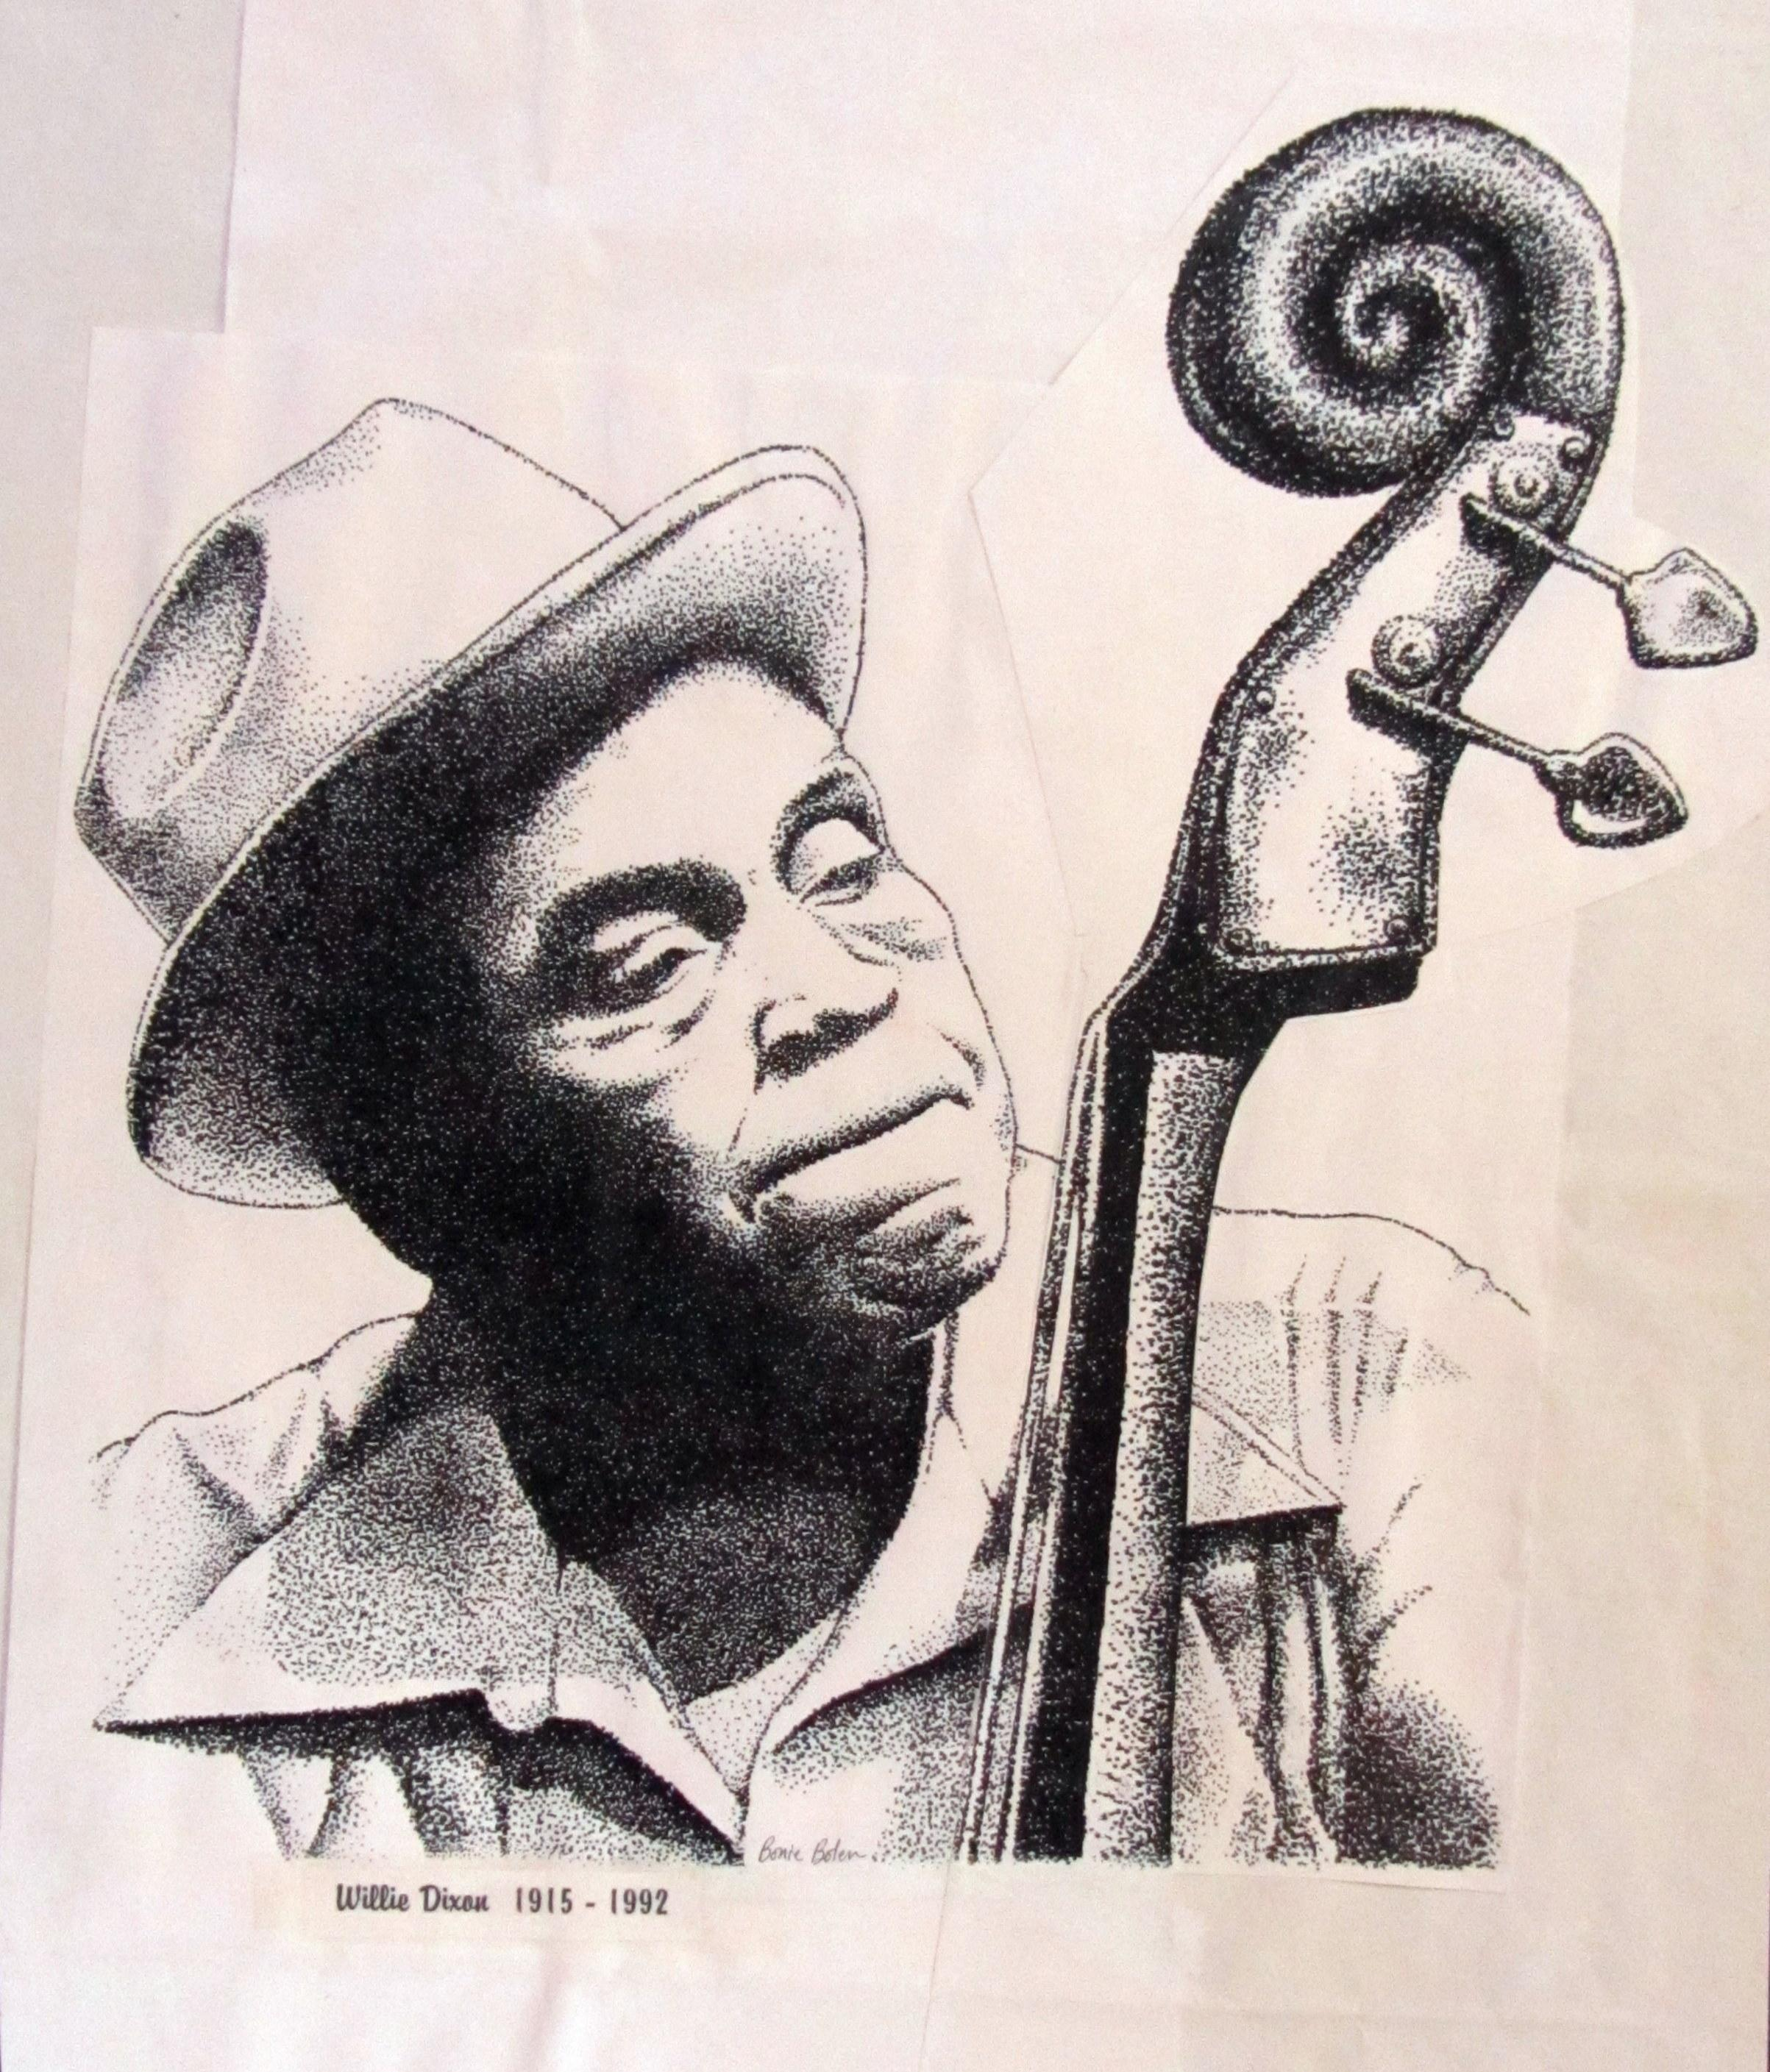 2406x2817 Bonie Bolen Artwork Willie Dixon Original Drawing Pen Music Art